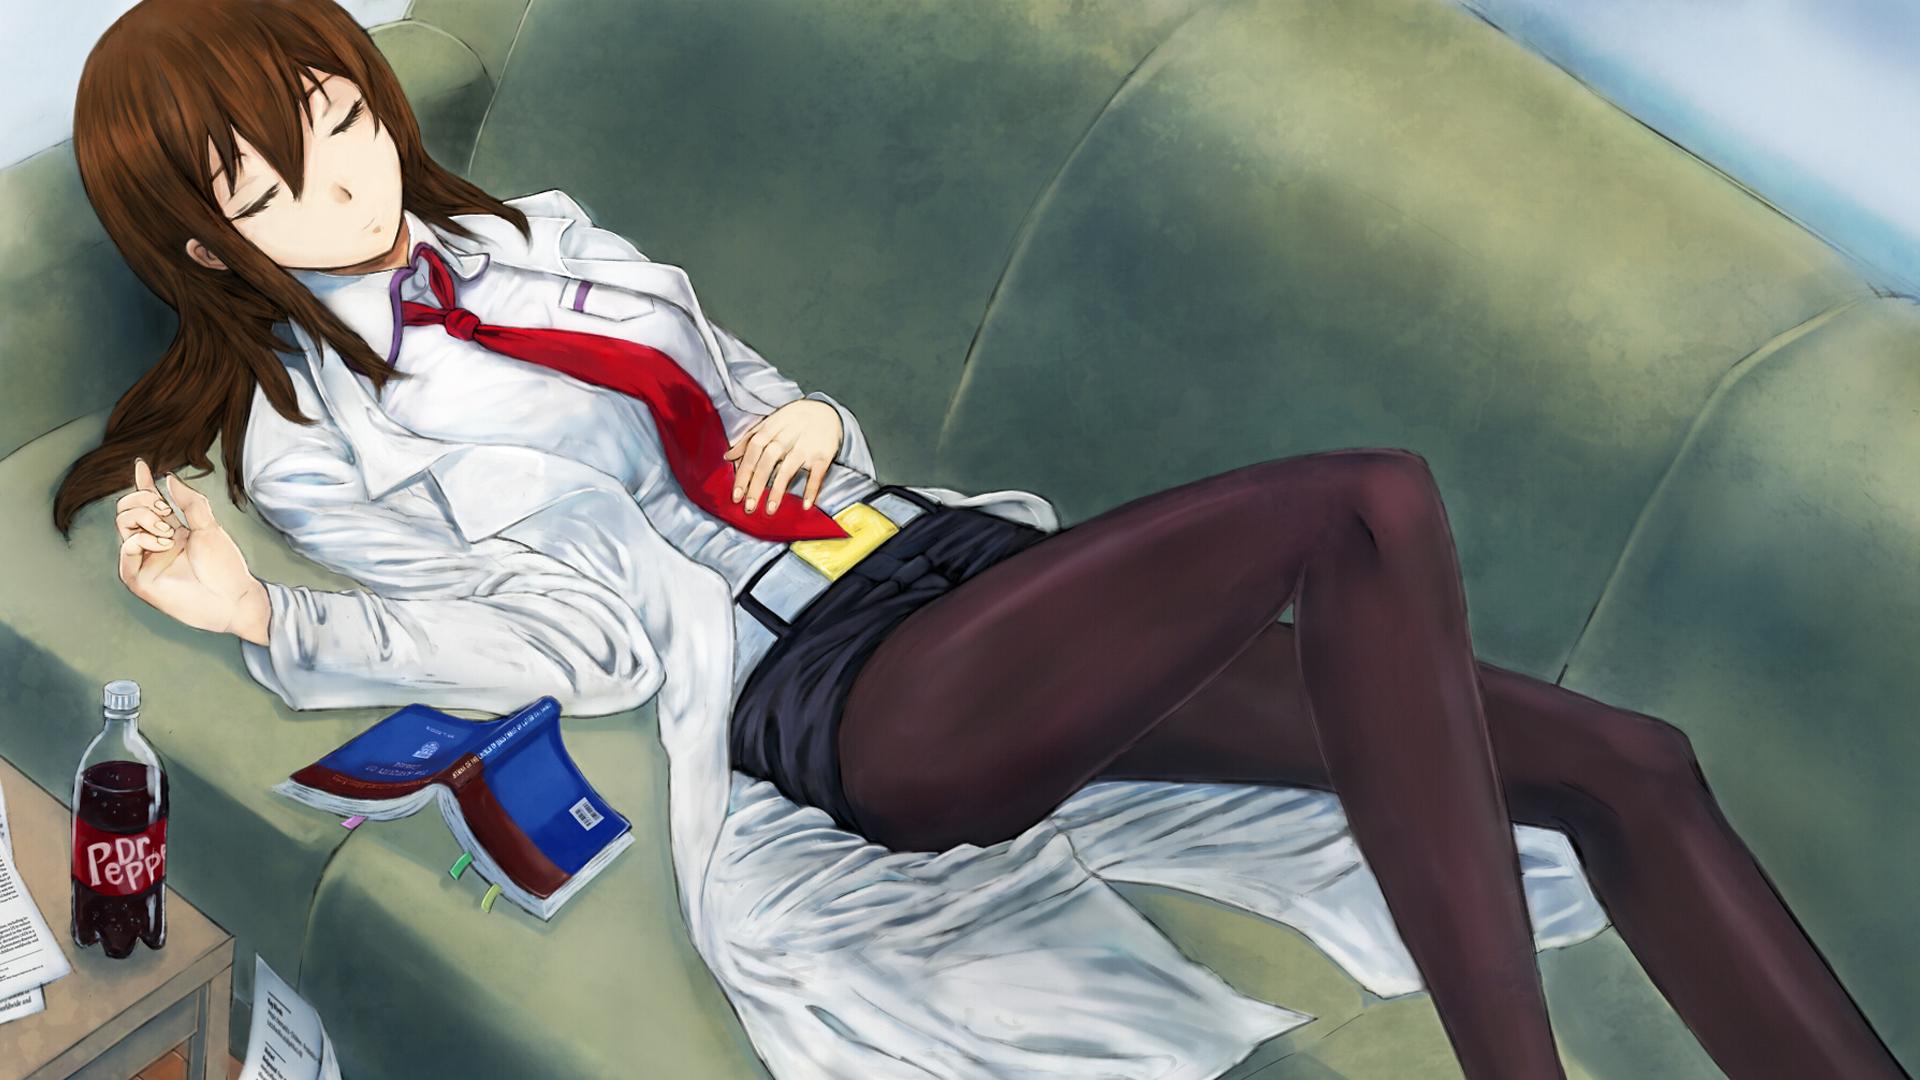 Steins Gate Anime 37 High Resolution Wallpaper